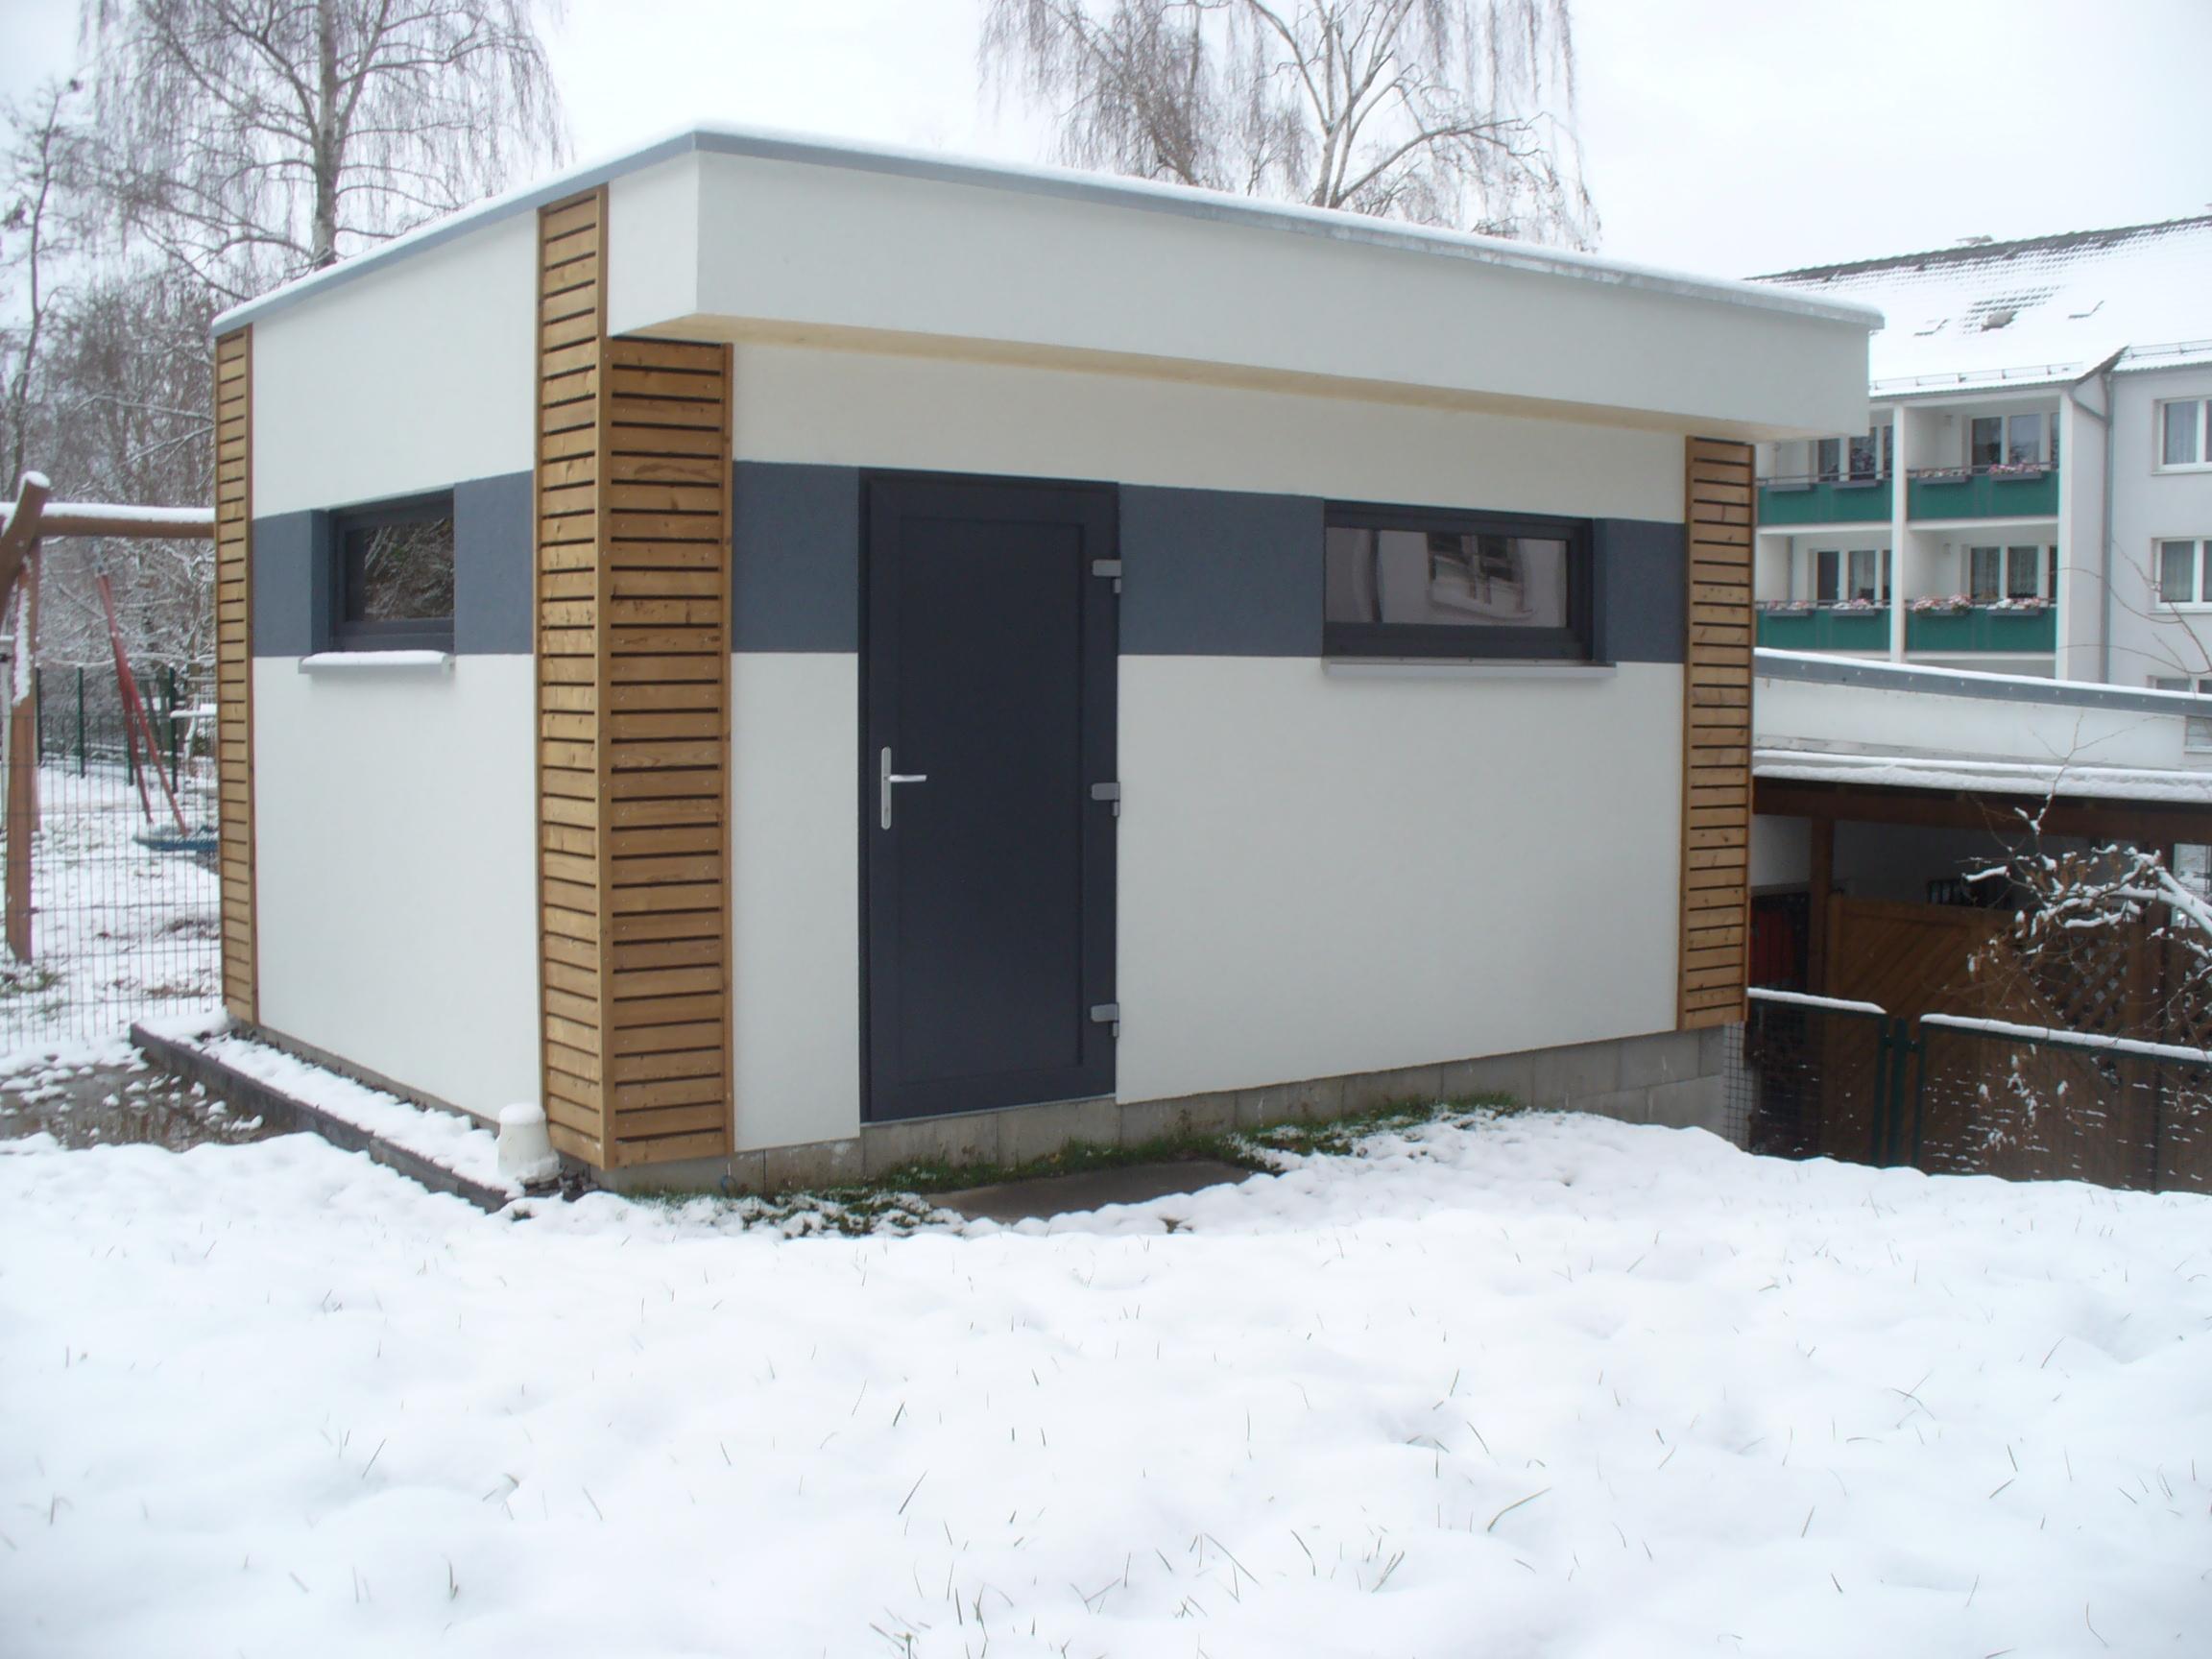 Gartenhaus Bauhaus Baumarkt Gartenhaus Bauhaus Baumarkt